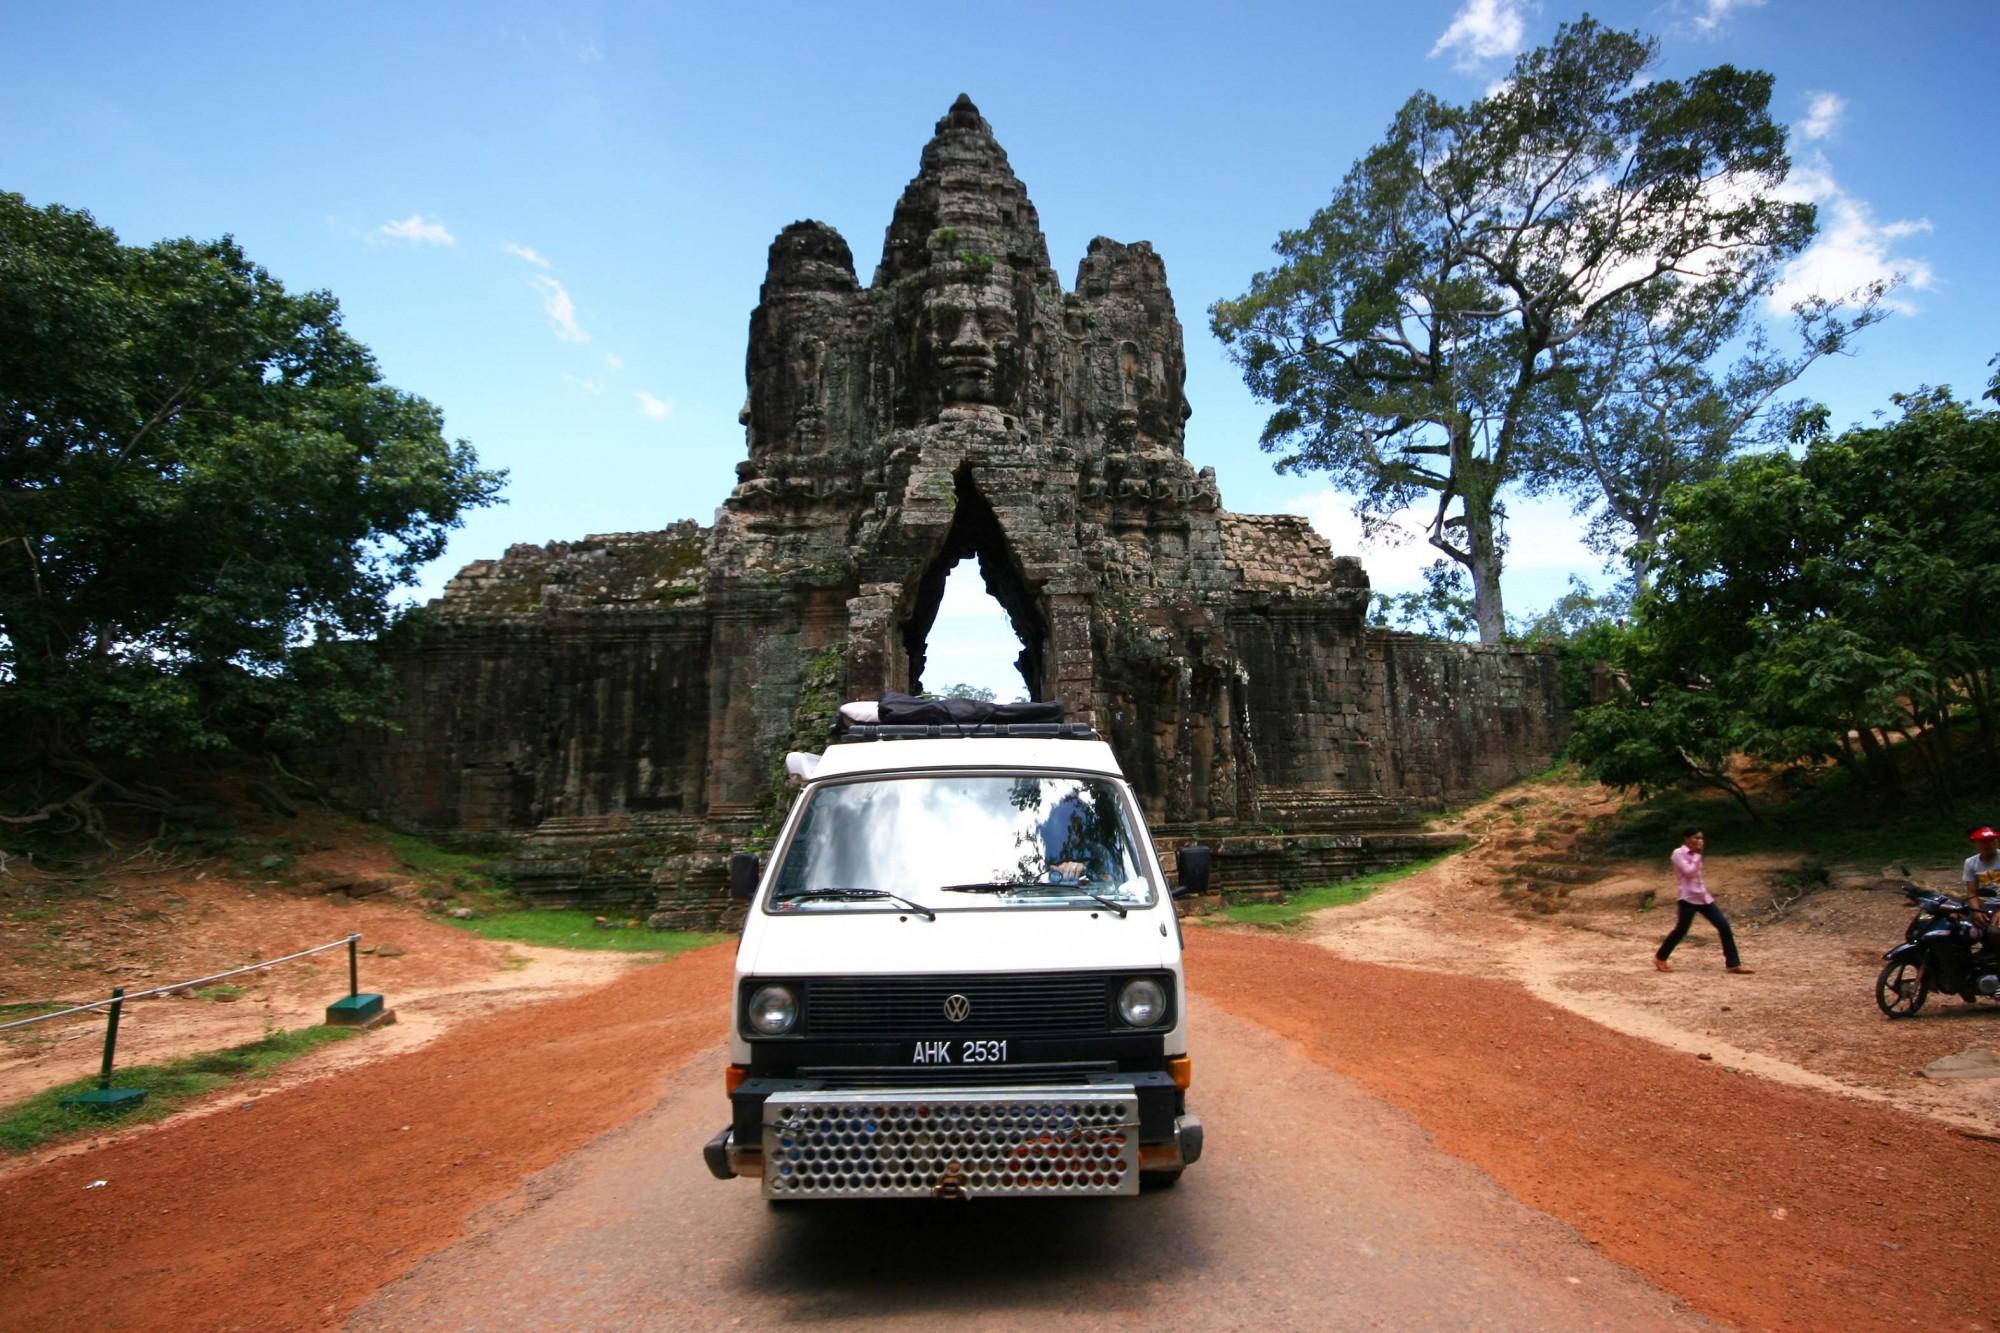 Arriving at Angkor Wat in Cambodia